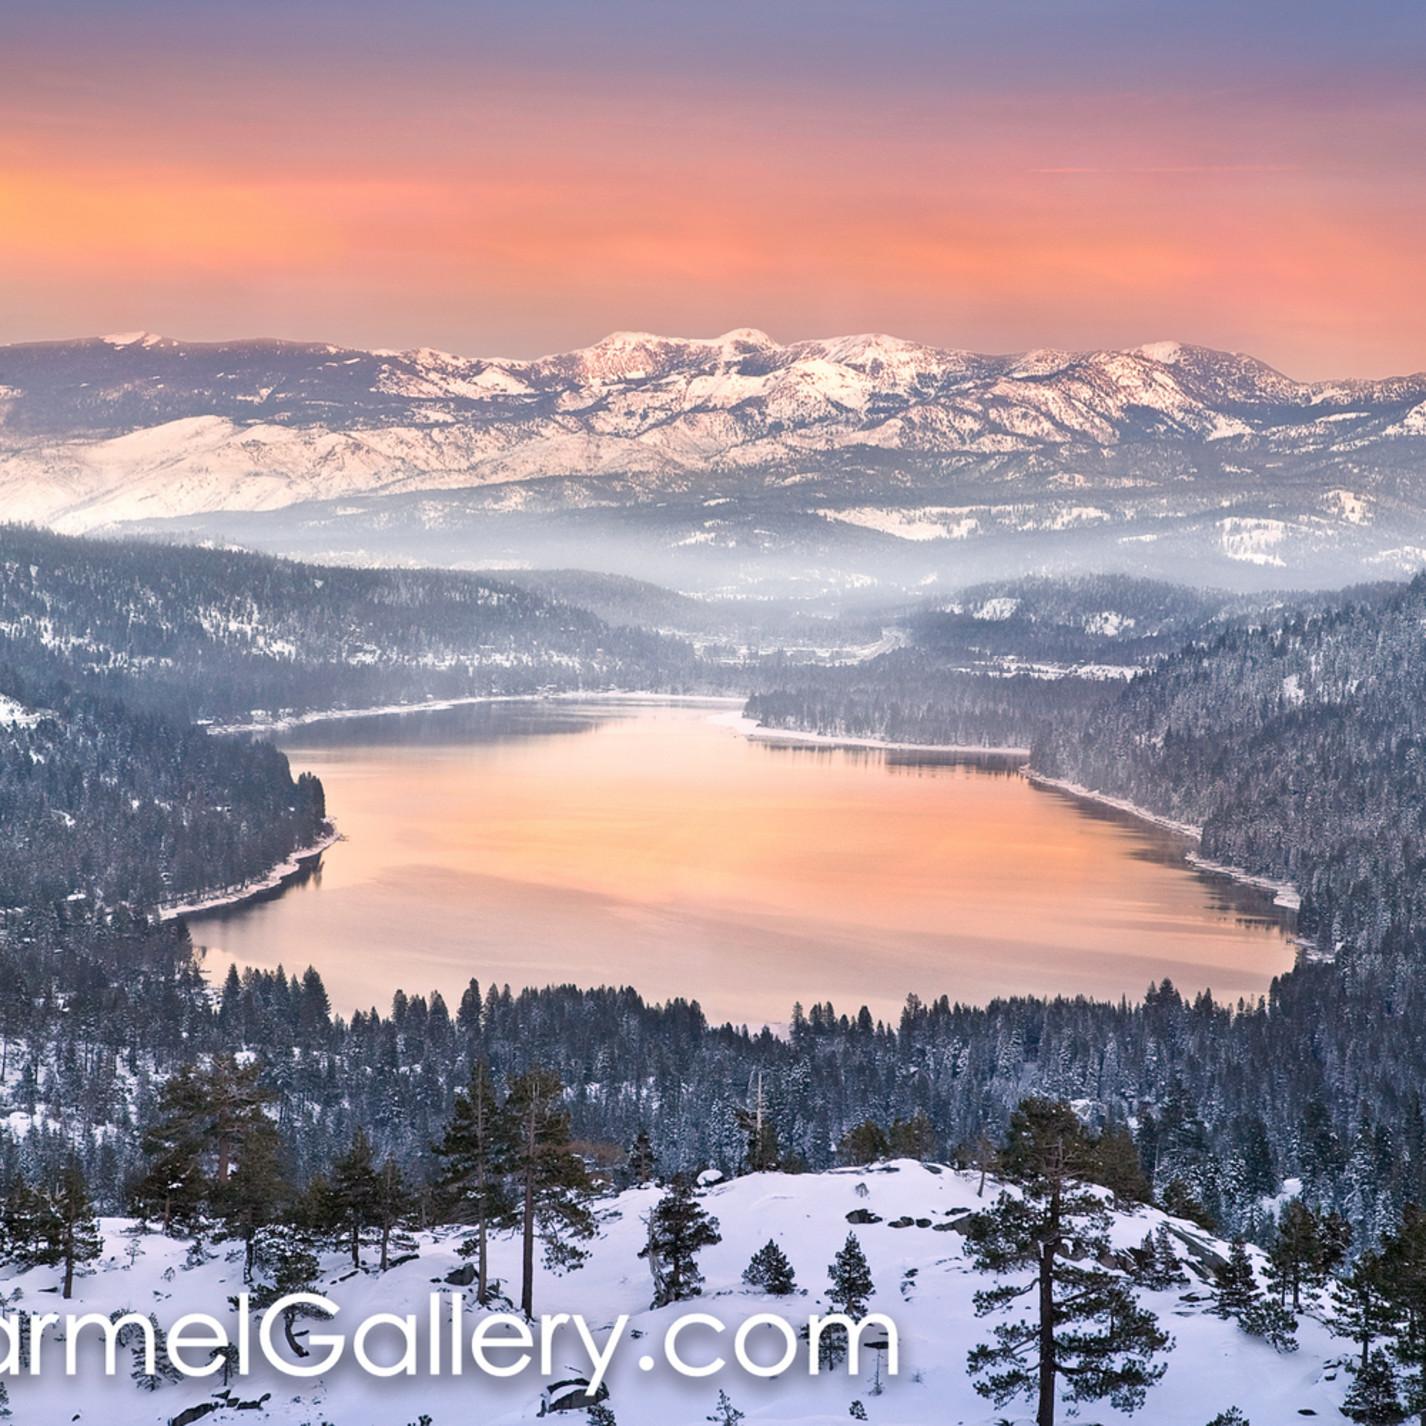 Afterglow donner lake fsrrt6